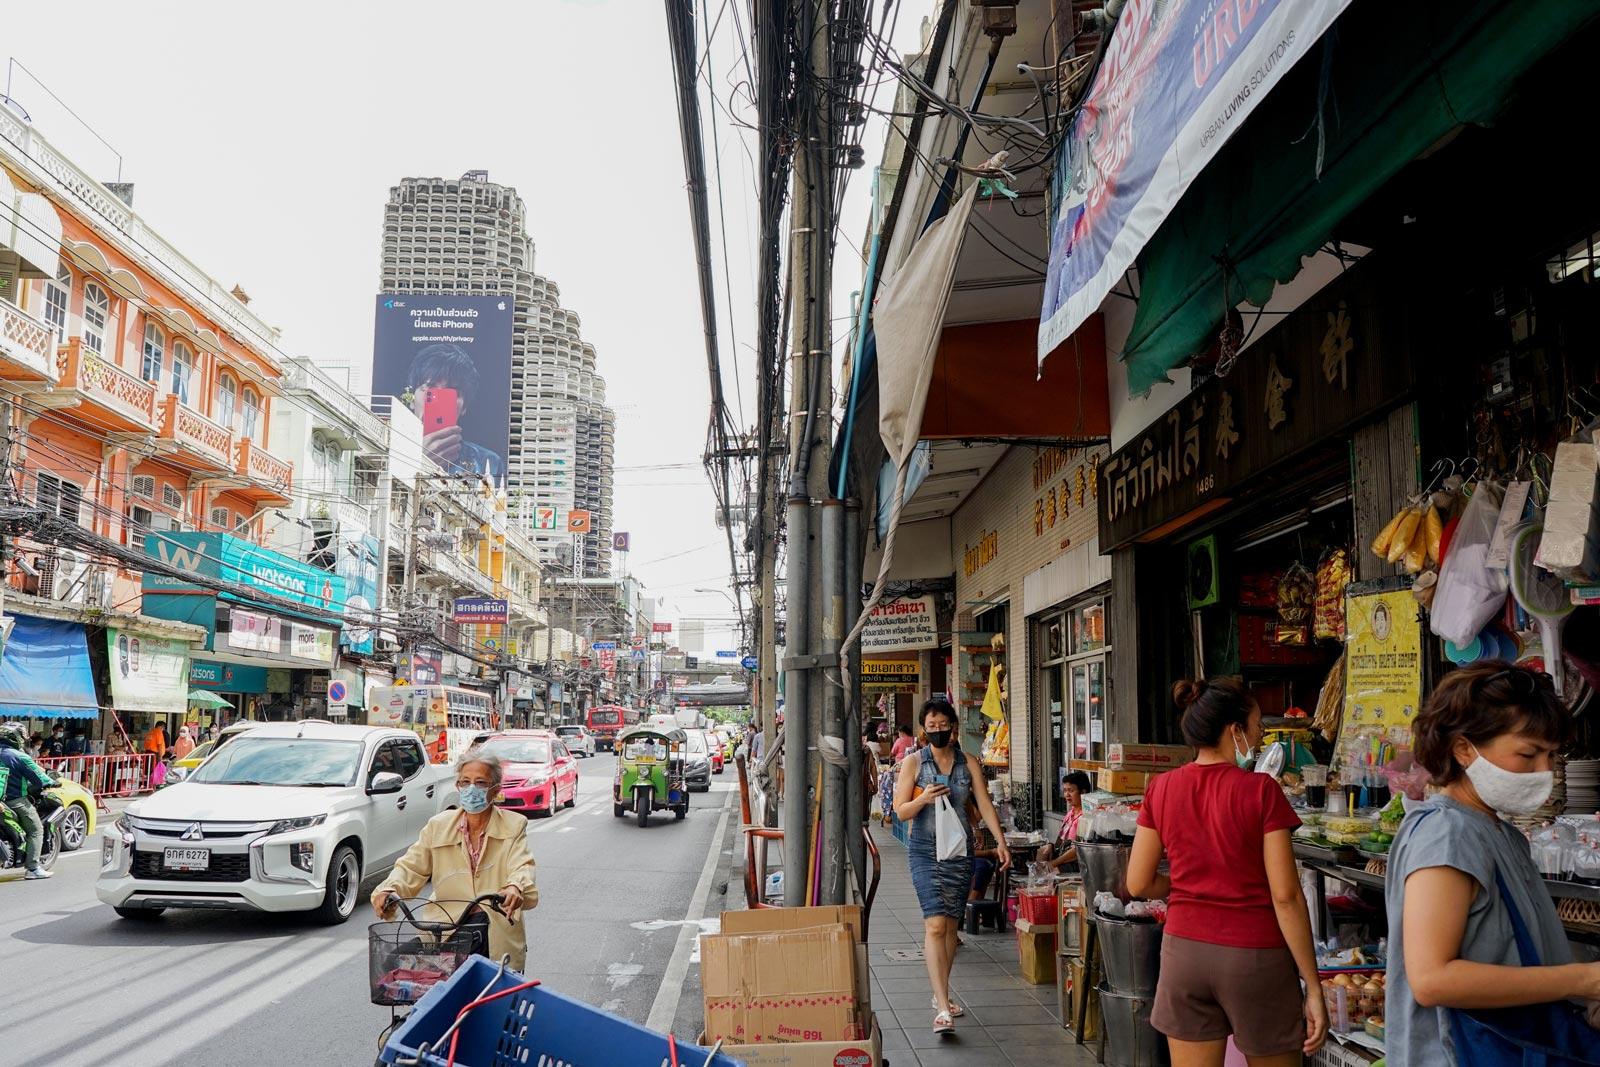 New ideas meet rich heritage on Bangkok's Charoenkrung Road